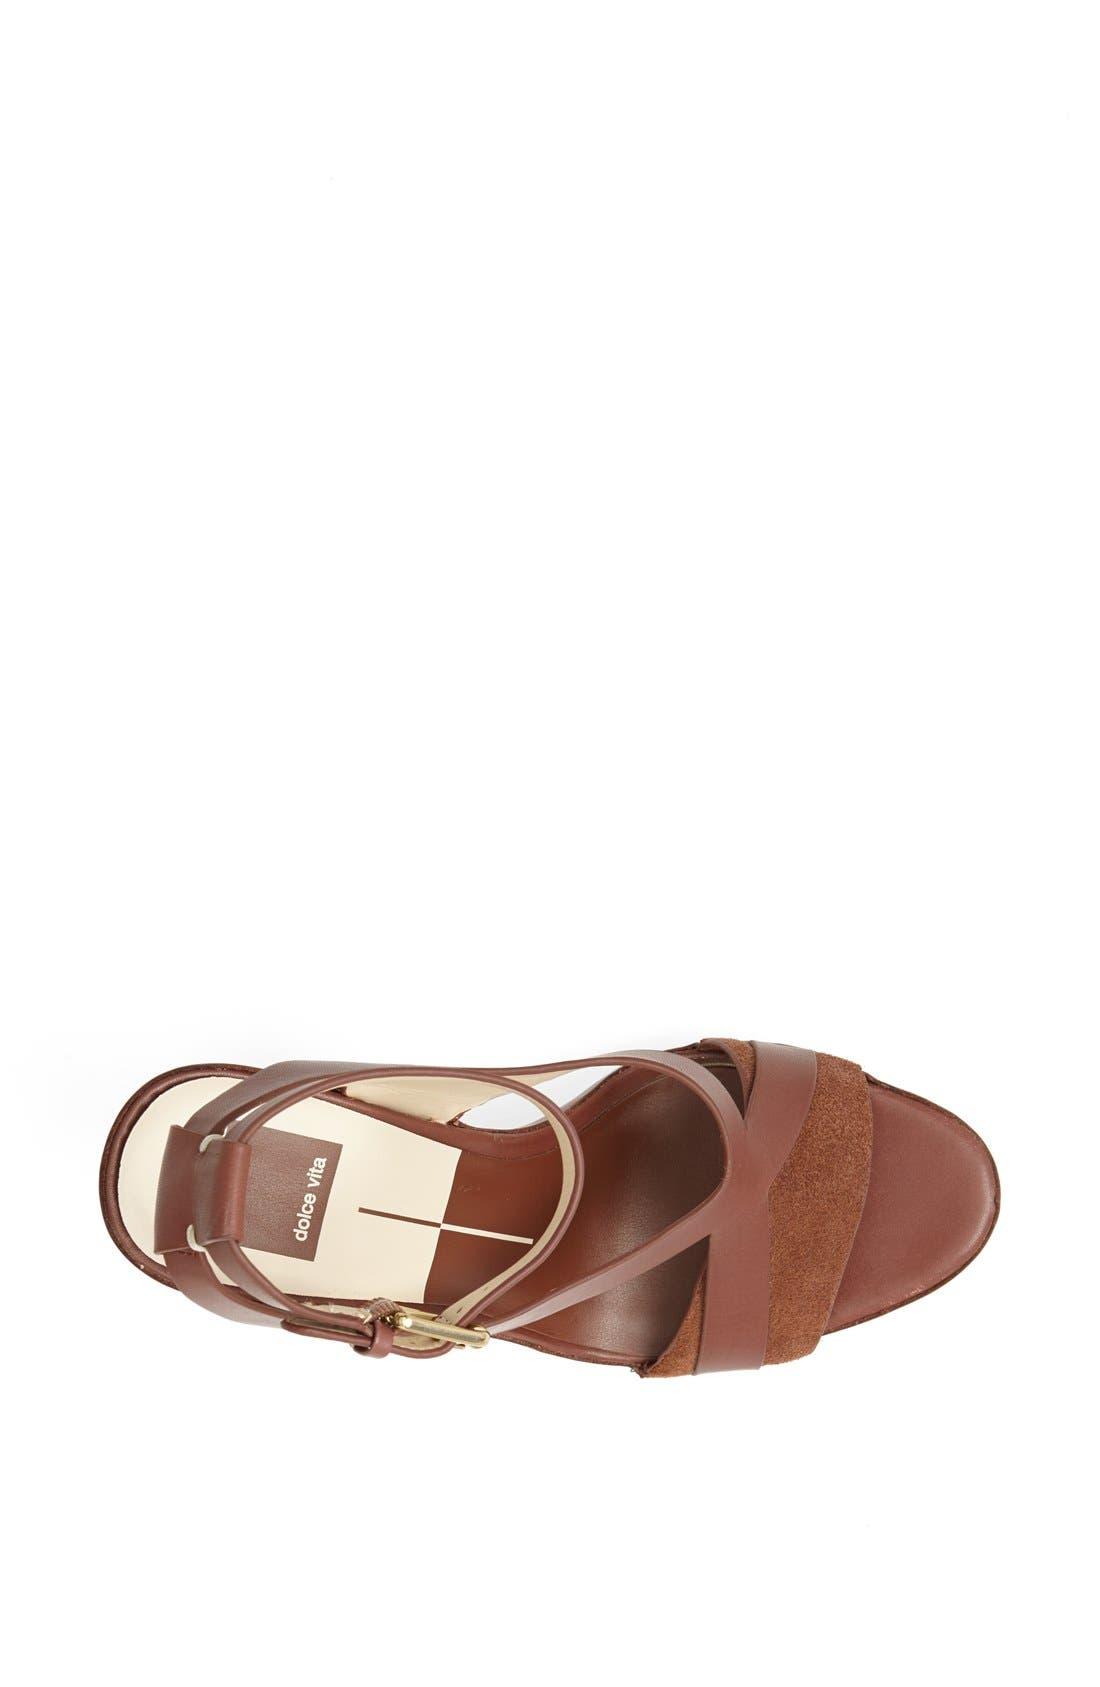 Alternate Image 3  - Dolce Vita 'Berit' Platform Sandal